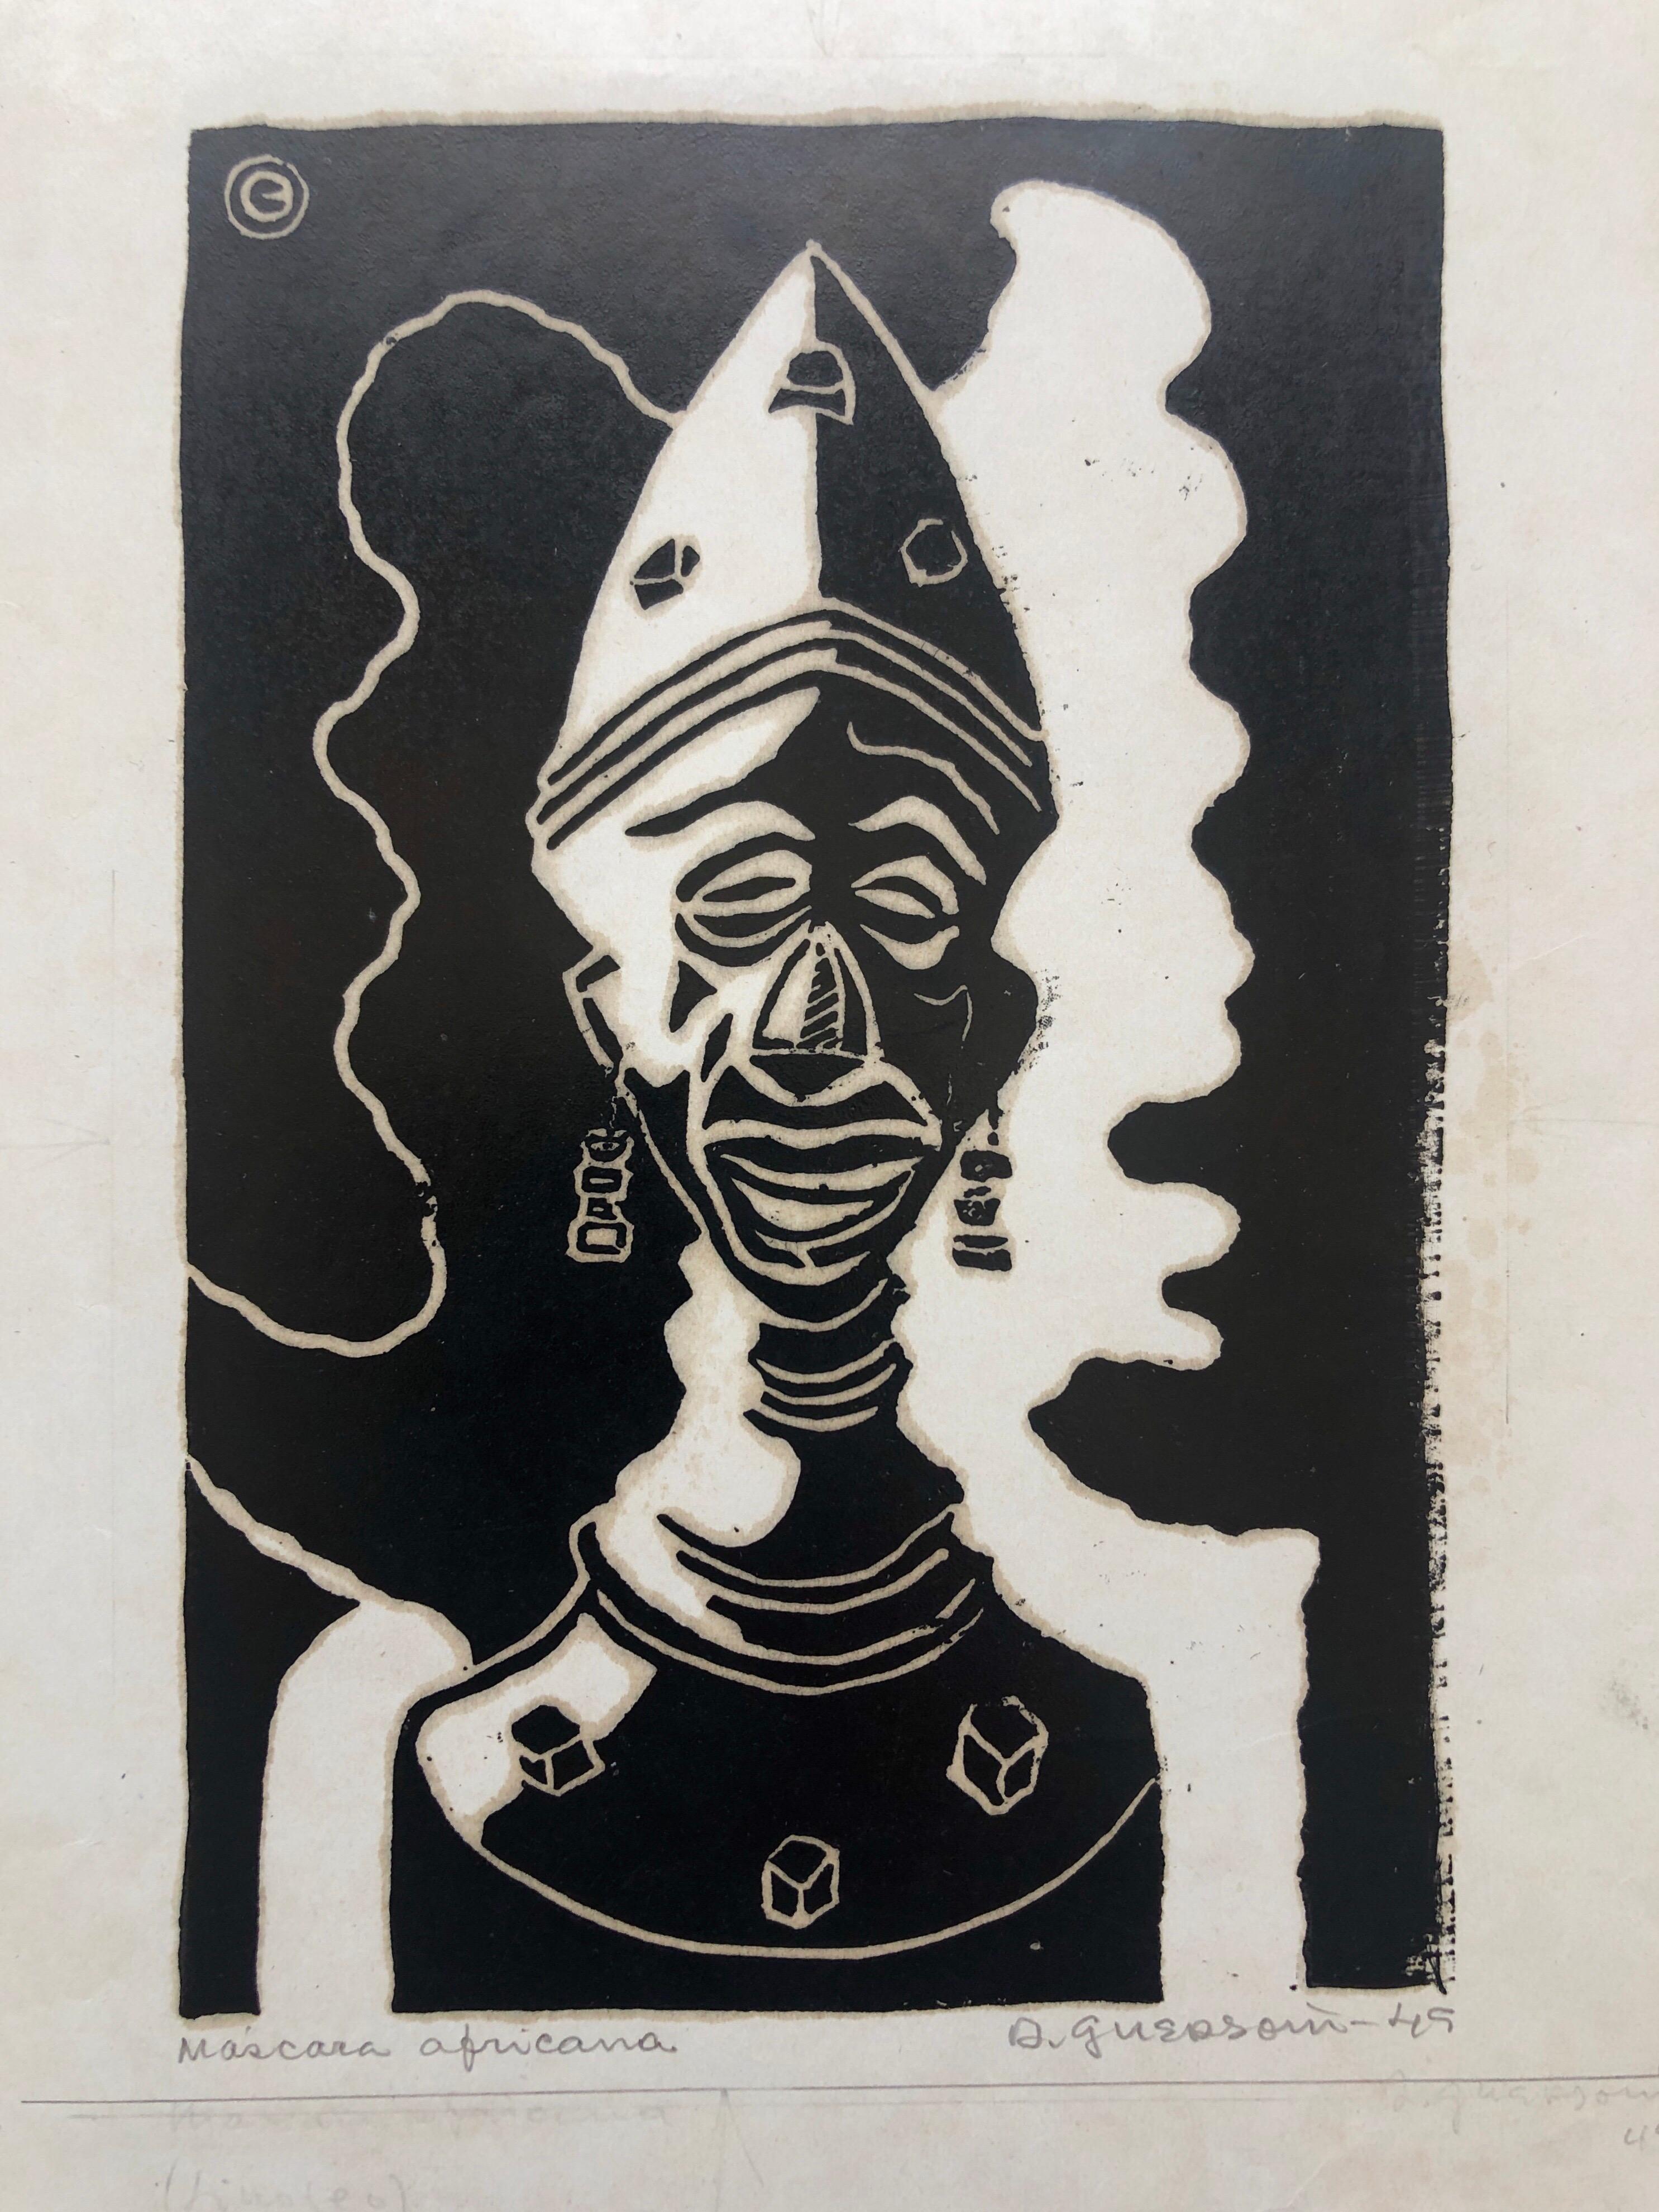 1945 Brazilian Master, Art Deco Clown Serigraph Woodcut